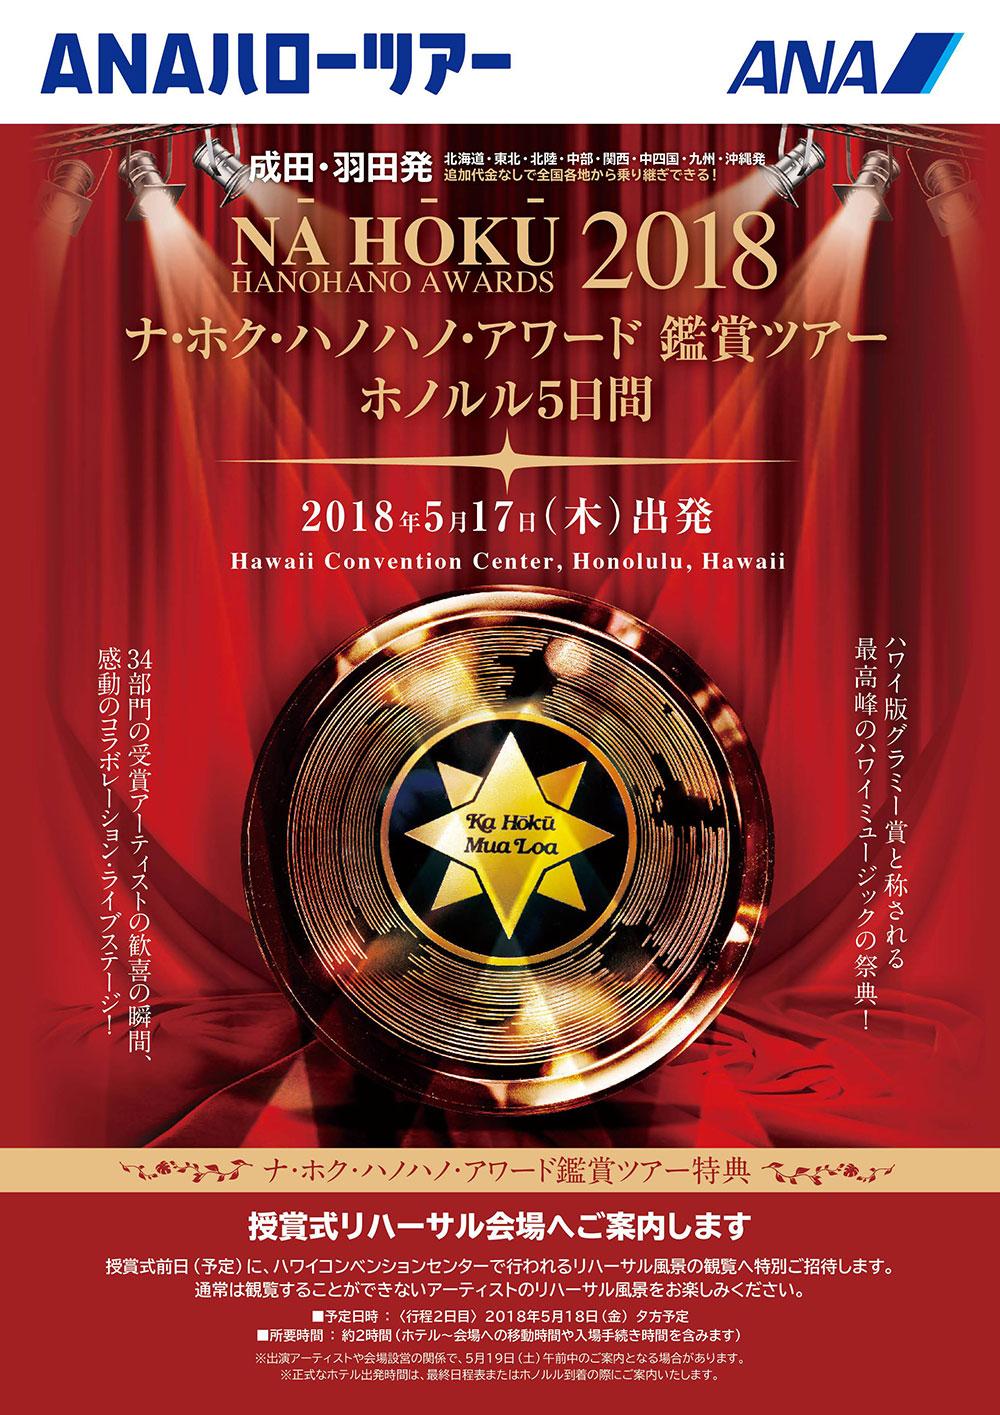 NA HOKU HANOHANO AWARDS 2018 鑑賞TOUR